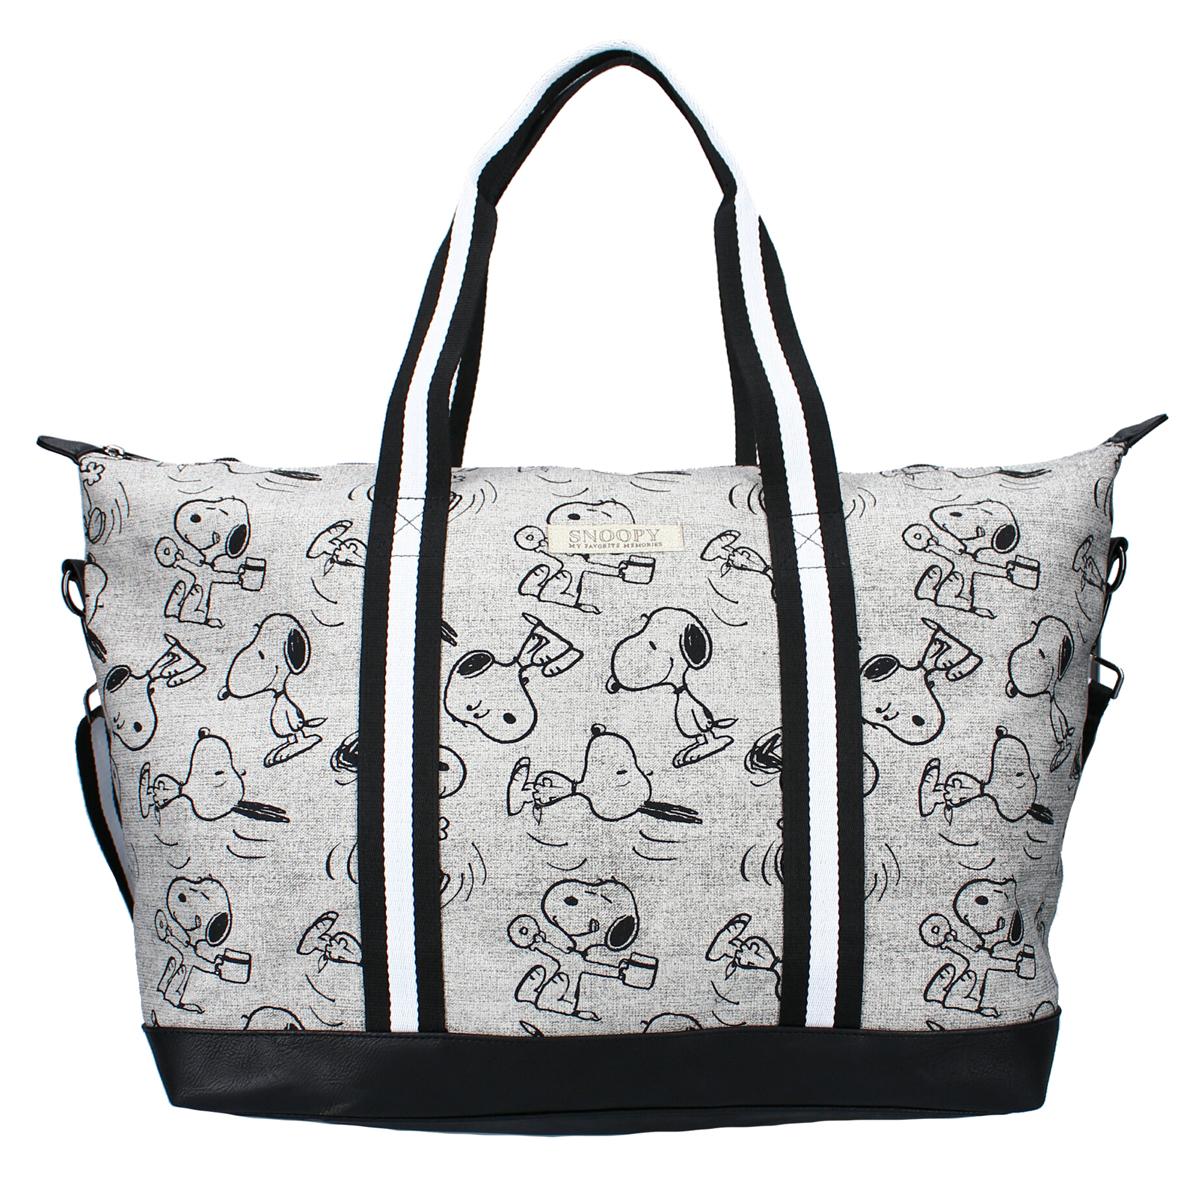 Sac shopping créateur \'Snoopy\' gris - 52x36x18 cm - [A3036]